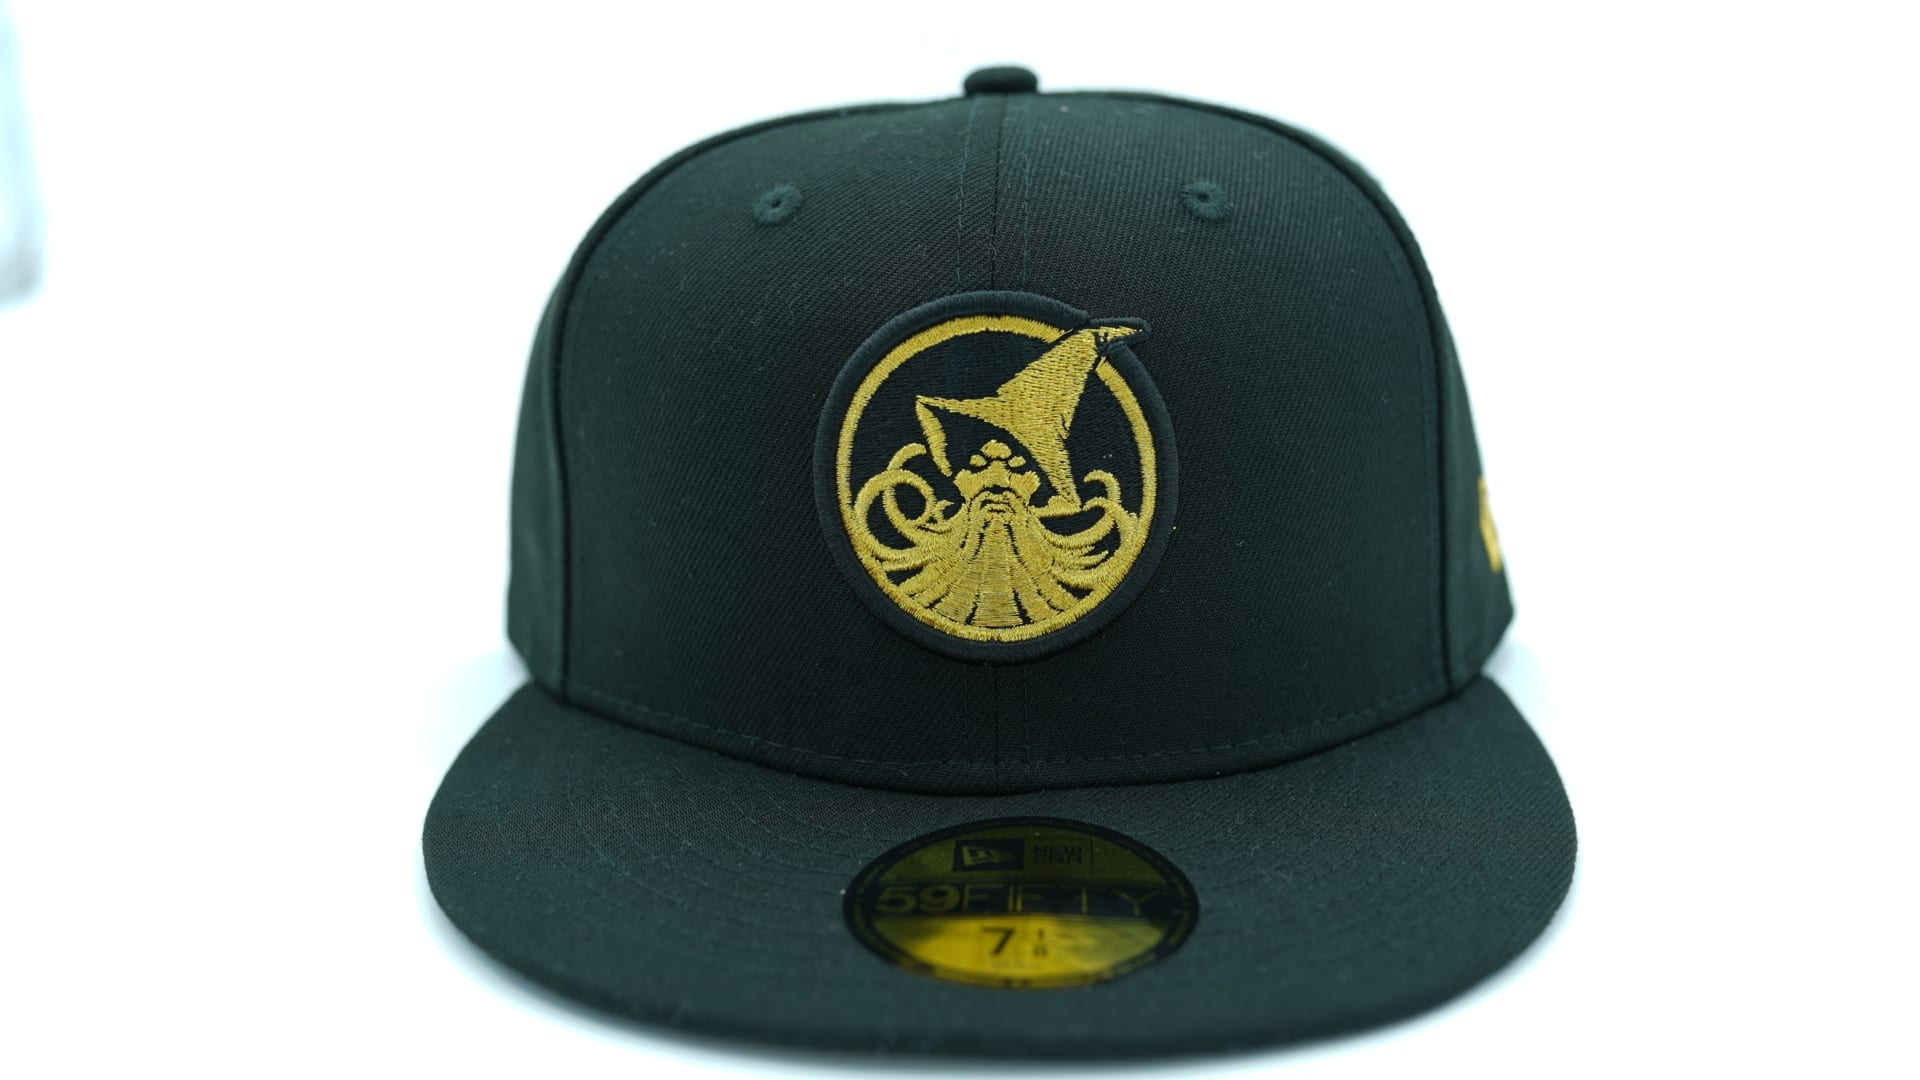 Mlb Hats Today - 0425